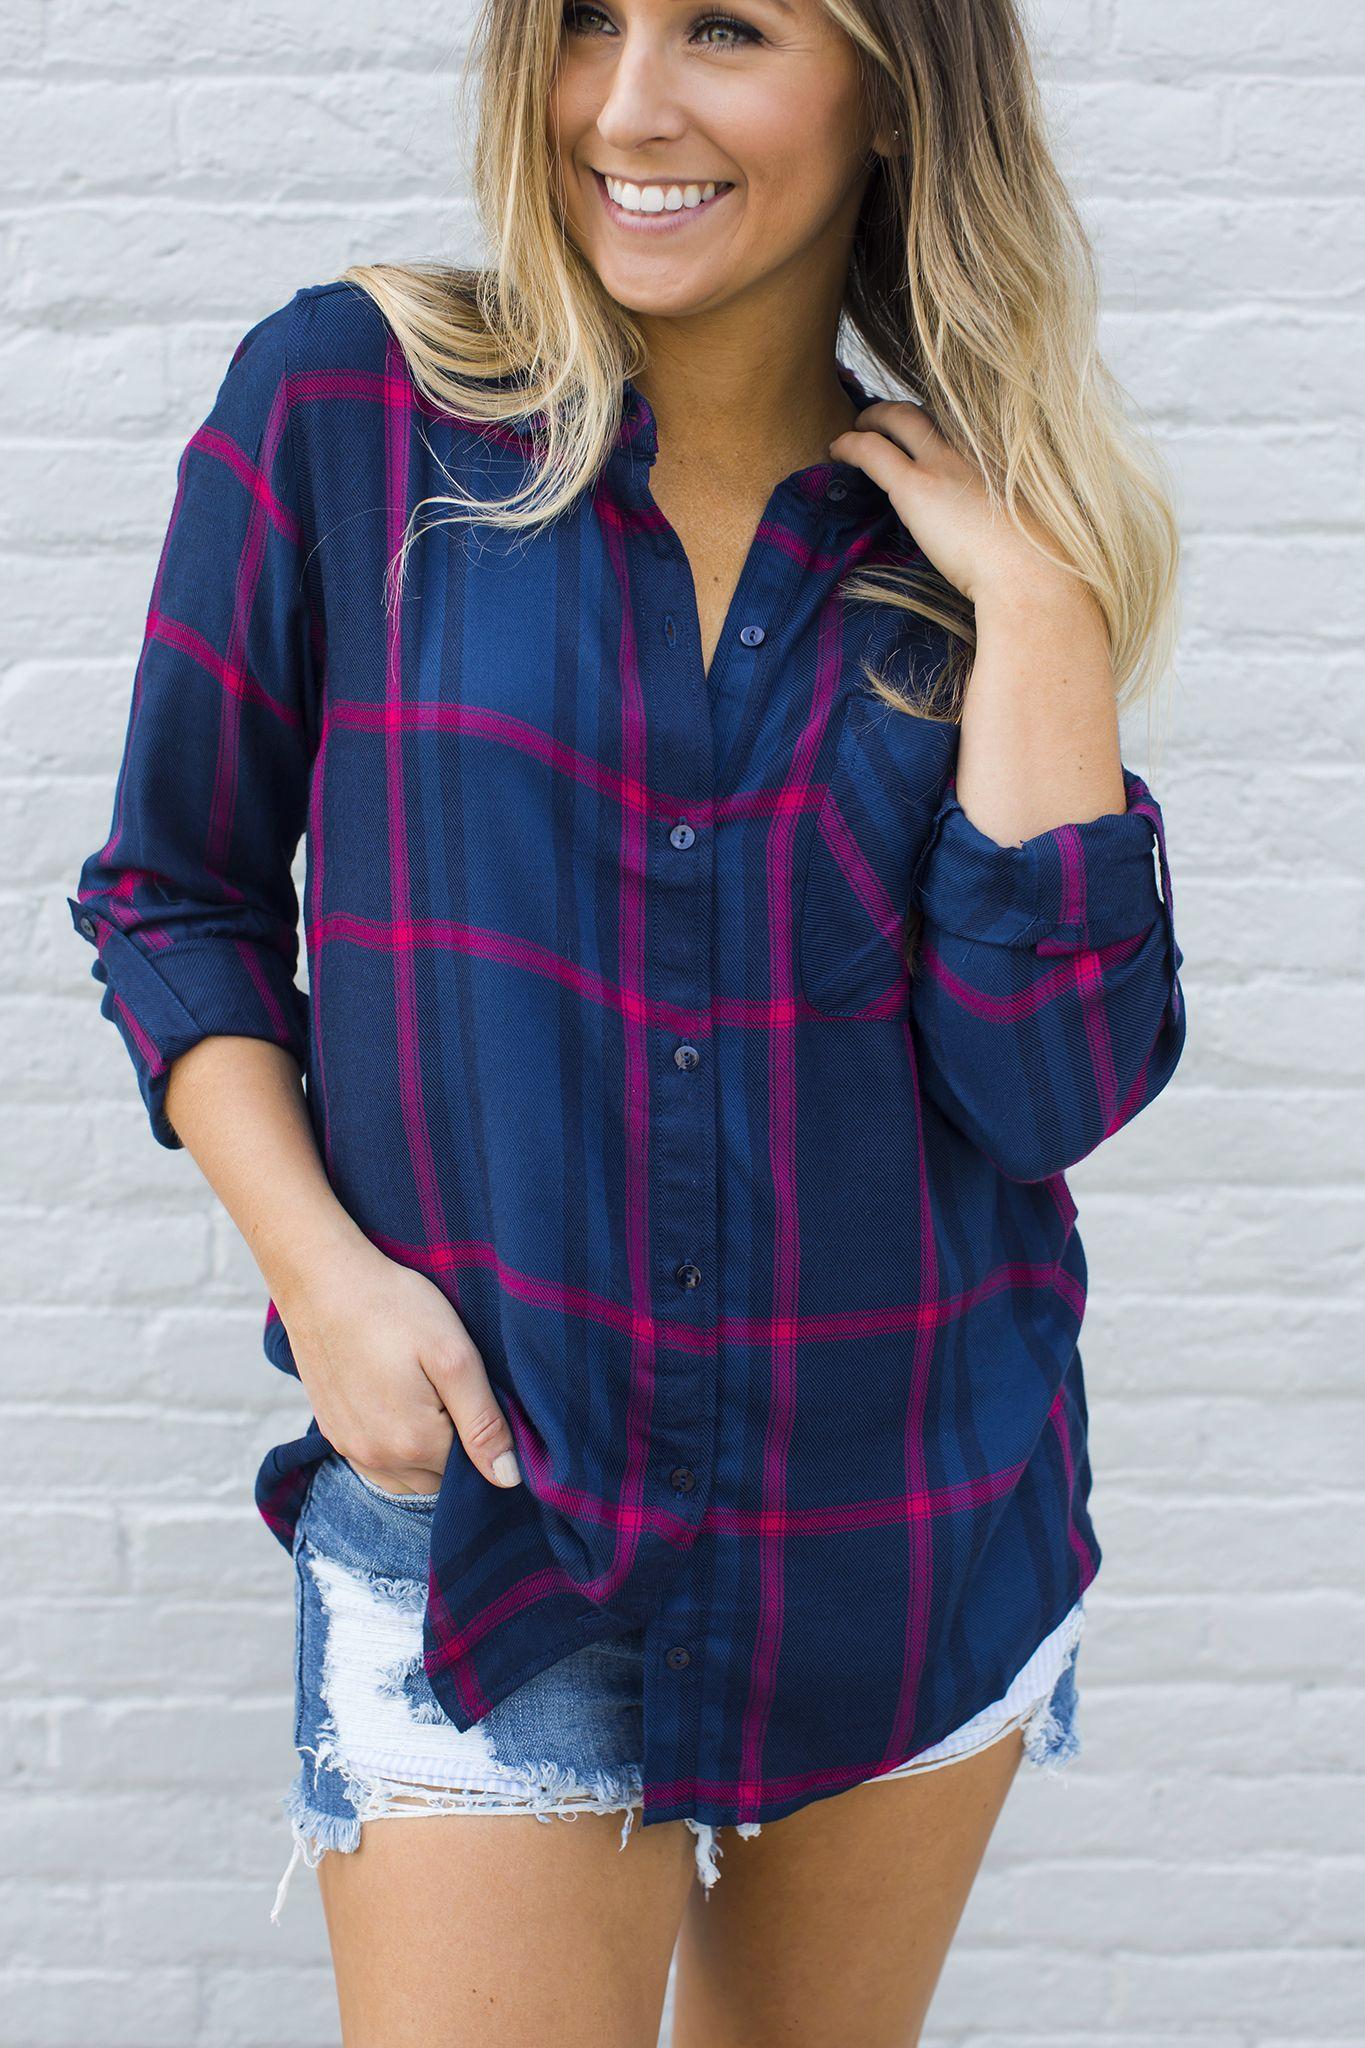 Flannel shirt with khaki pants  NavyRed Plaid Shirt  Tops  Pinterest  Red plaid Plaid and Navy